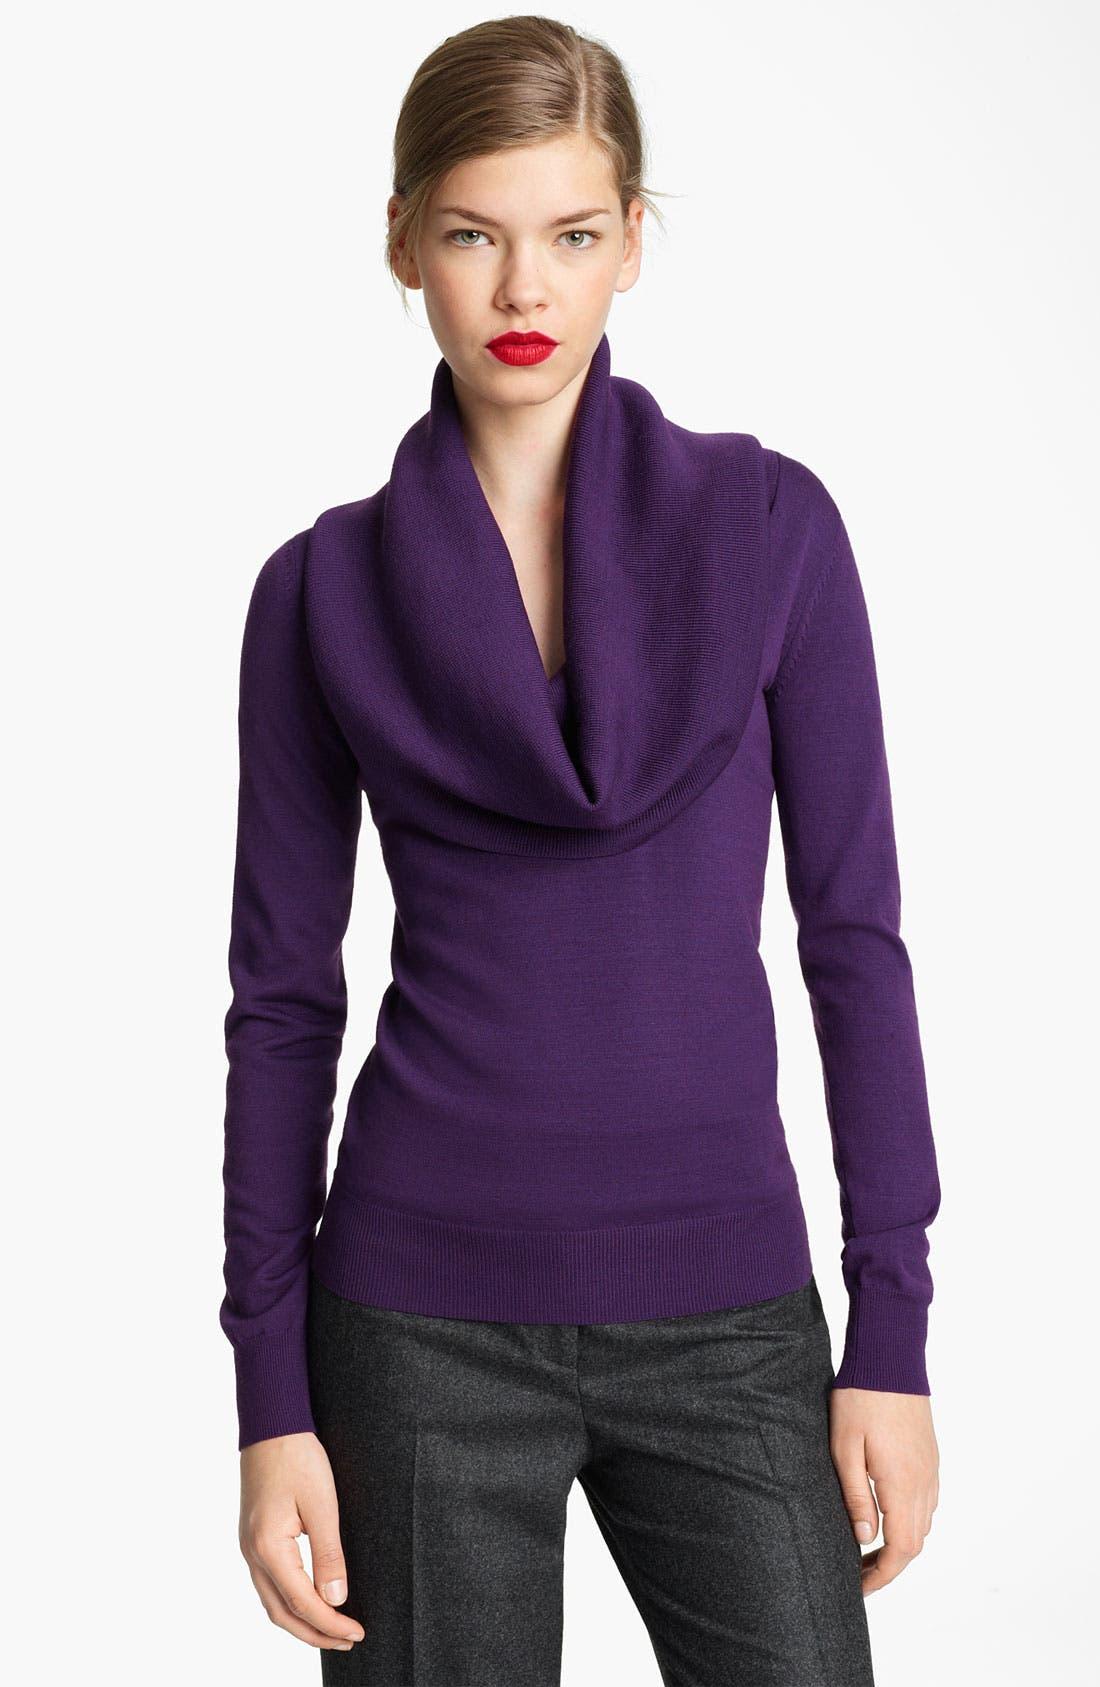 Alternate Image 1 Selected - Michael Kors Cowl Neck Merino Wool Sweater